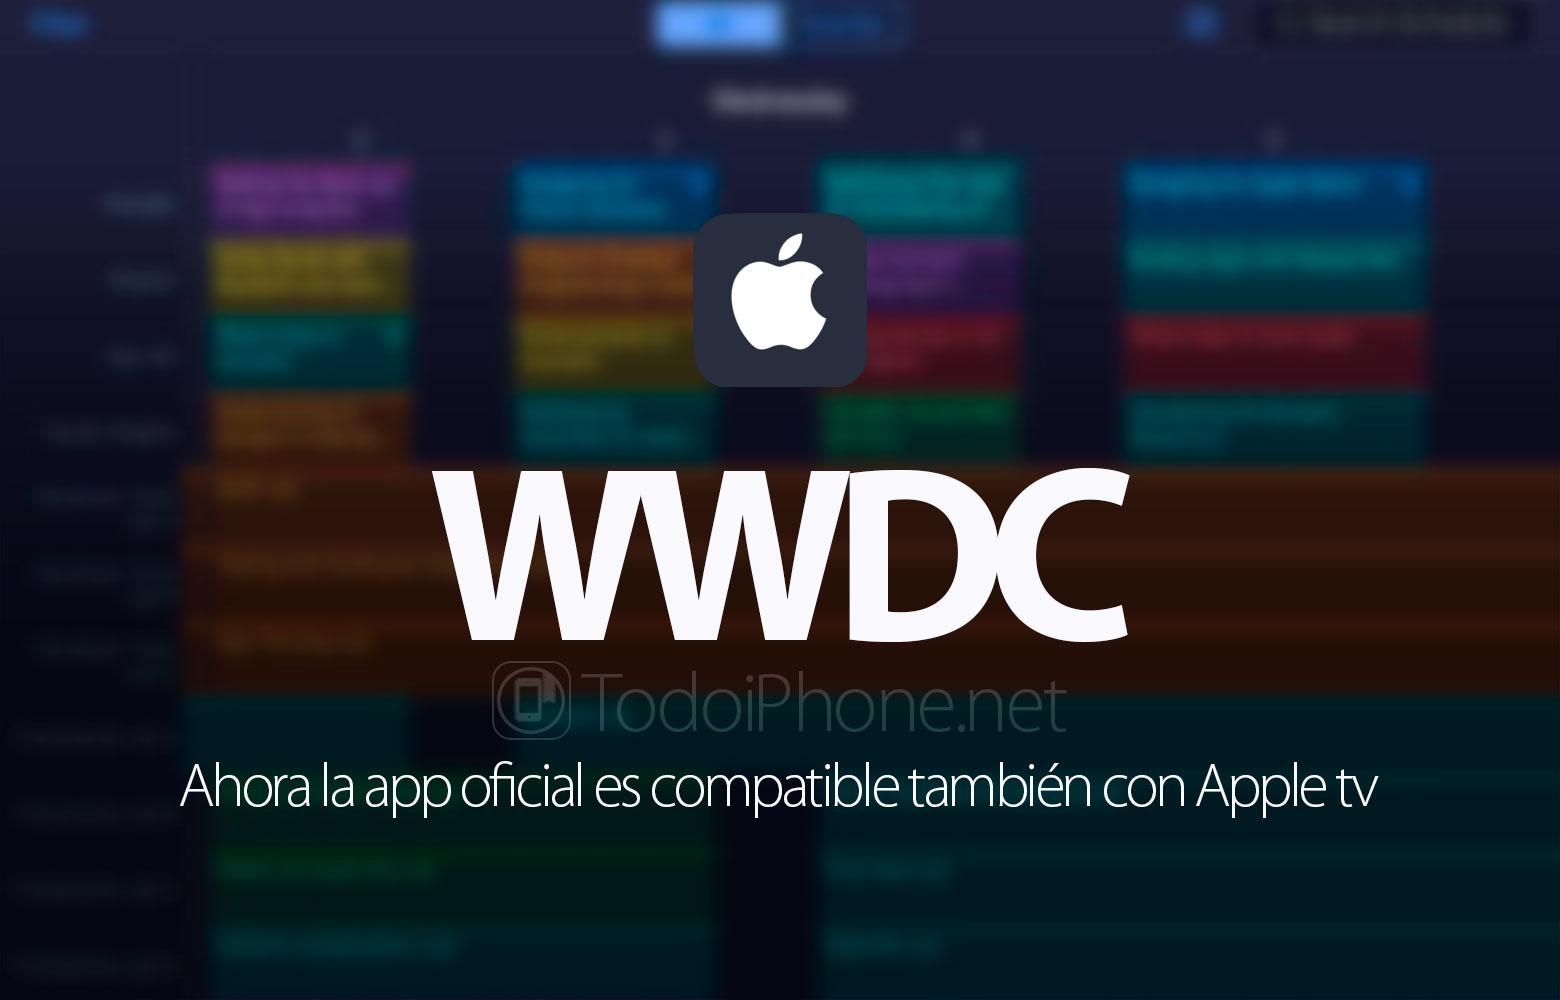 WWDC 2016 ، التطبيق الرسمي متوافق الآن مع Apple التلفزيون 1